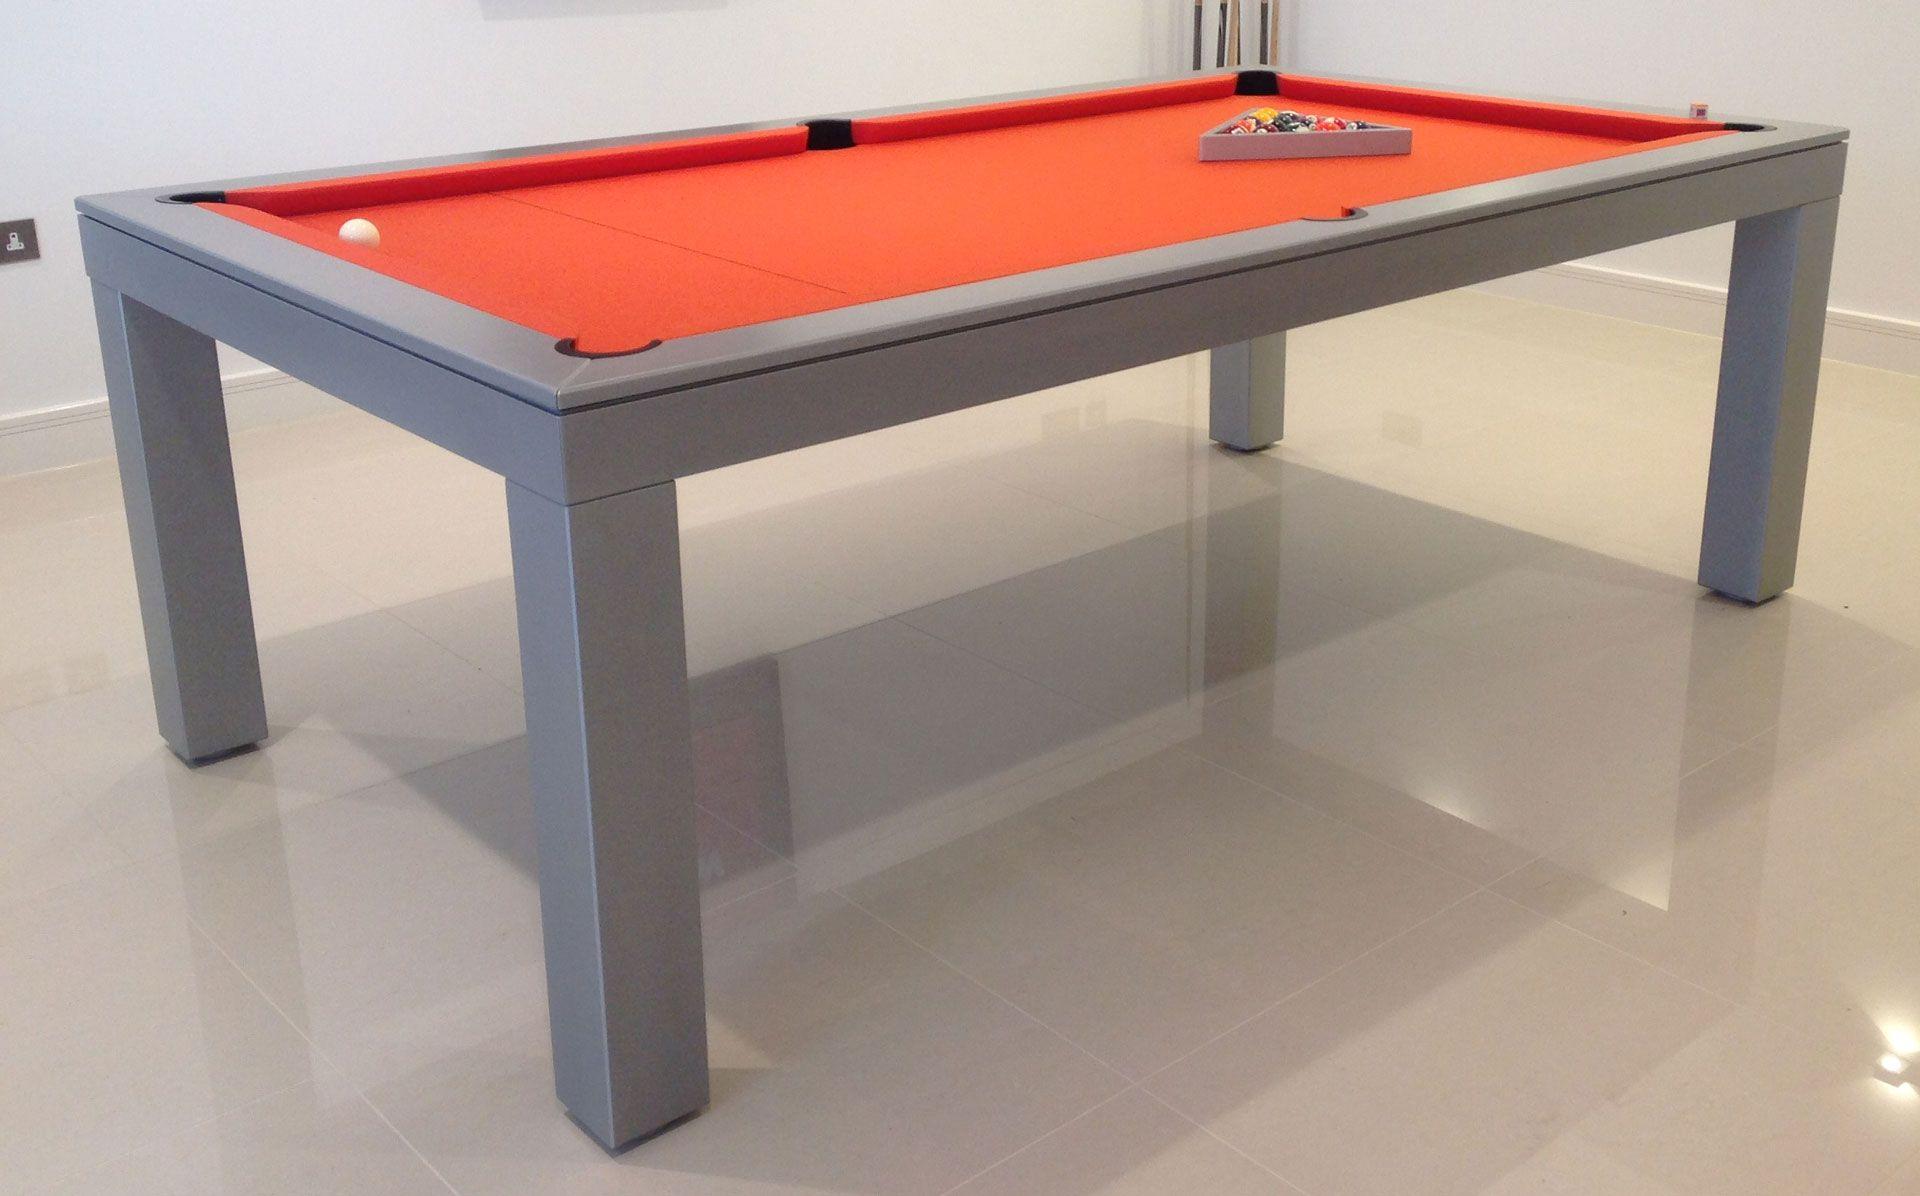 7 English Contemporary Pool Table In Oak Colour E21 With A Orange